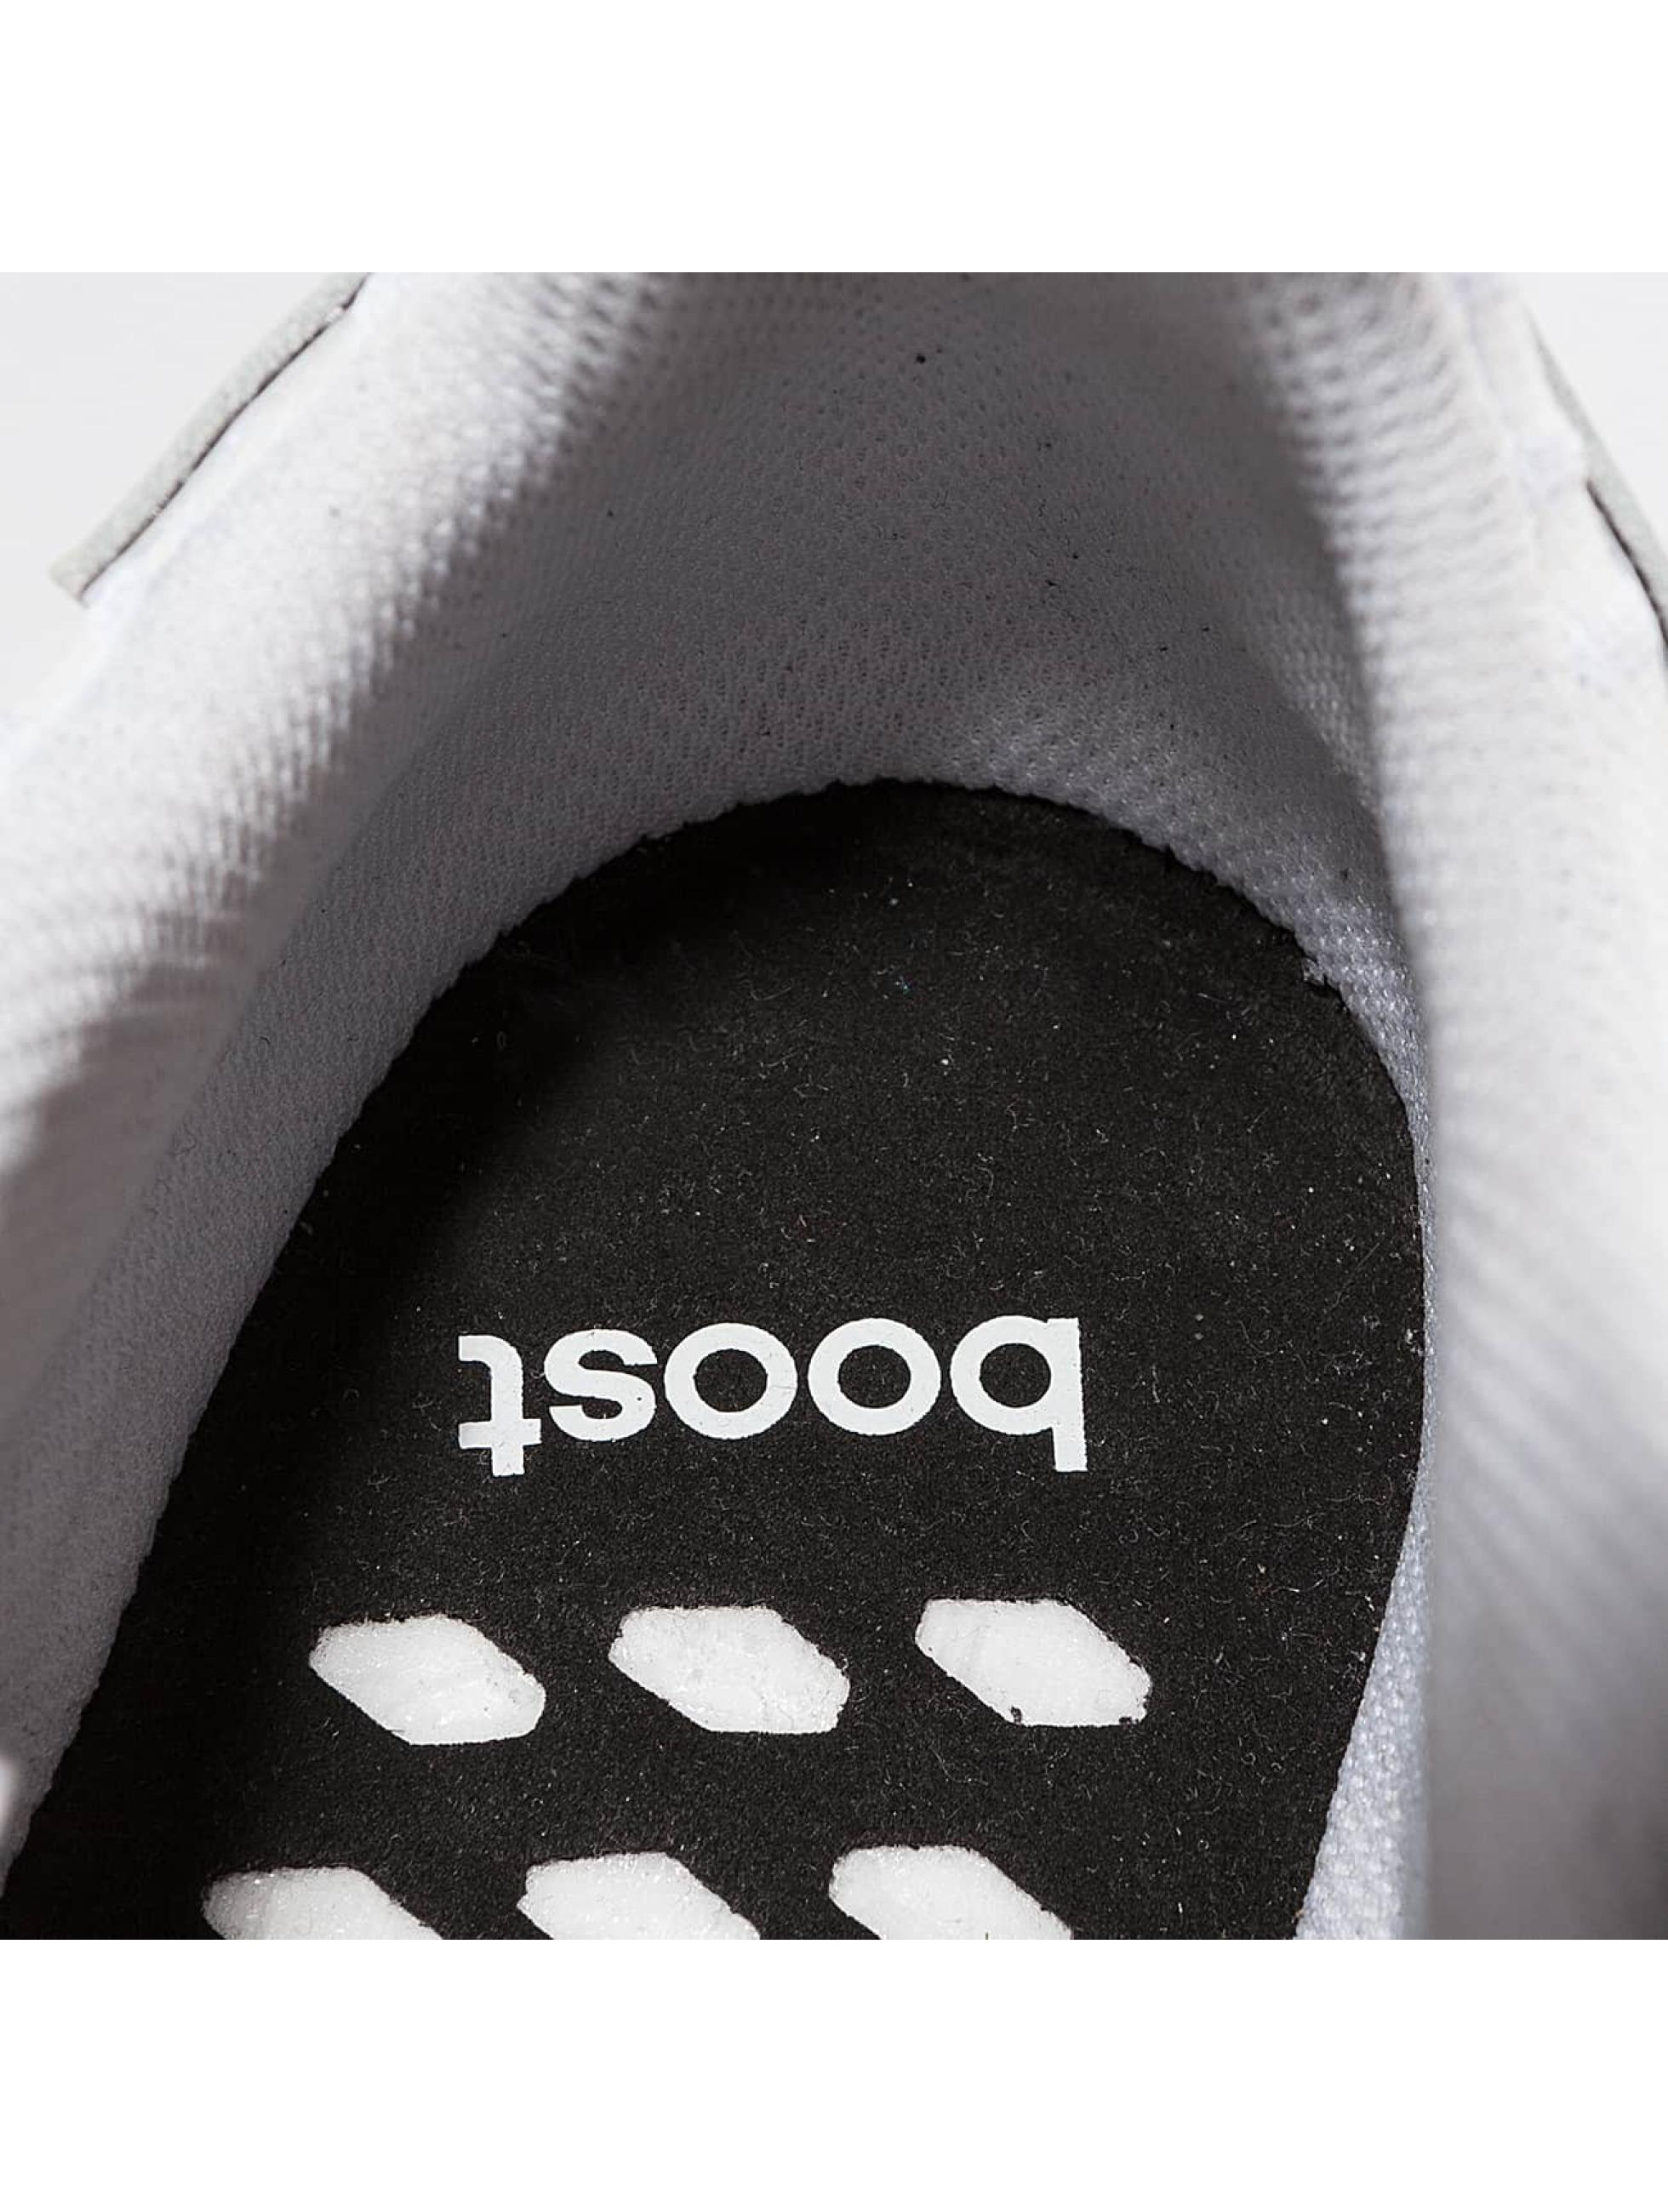 adidas Sneaker NMD_R2 Primeknit weiß